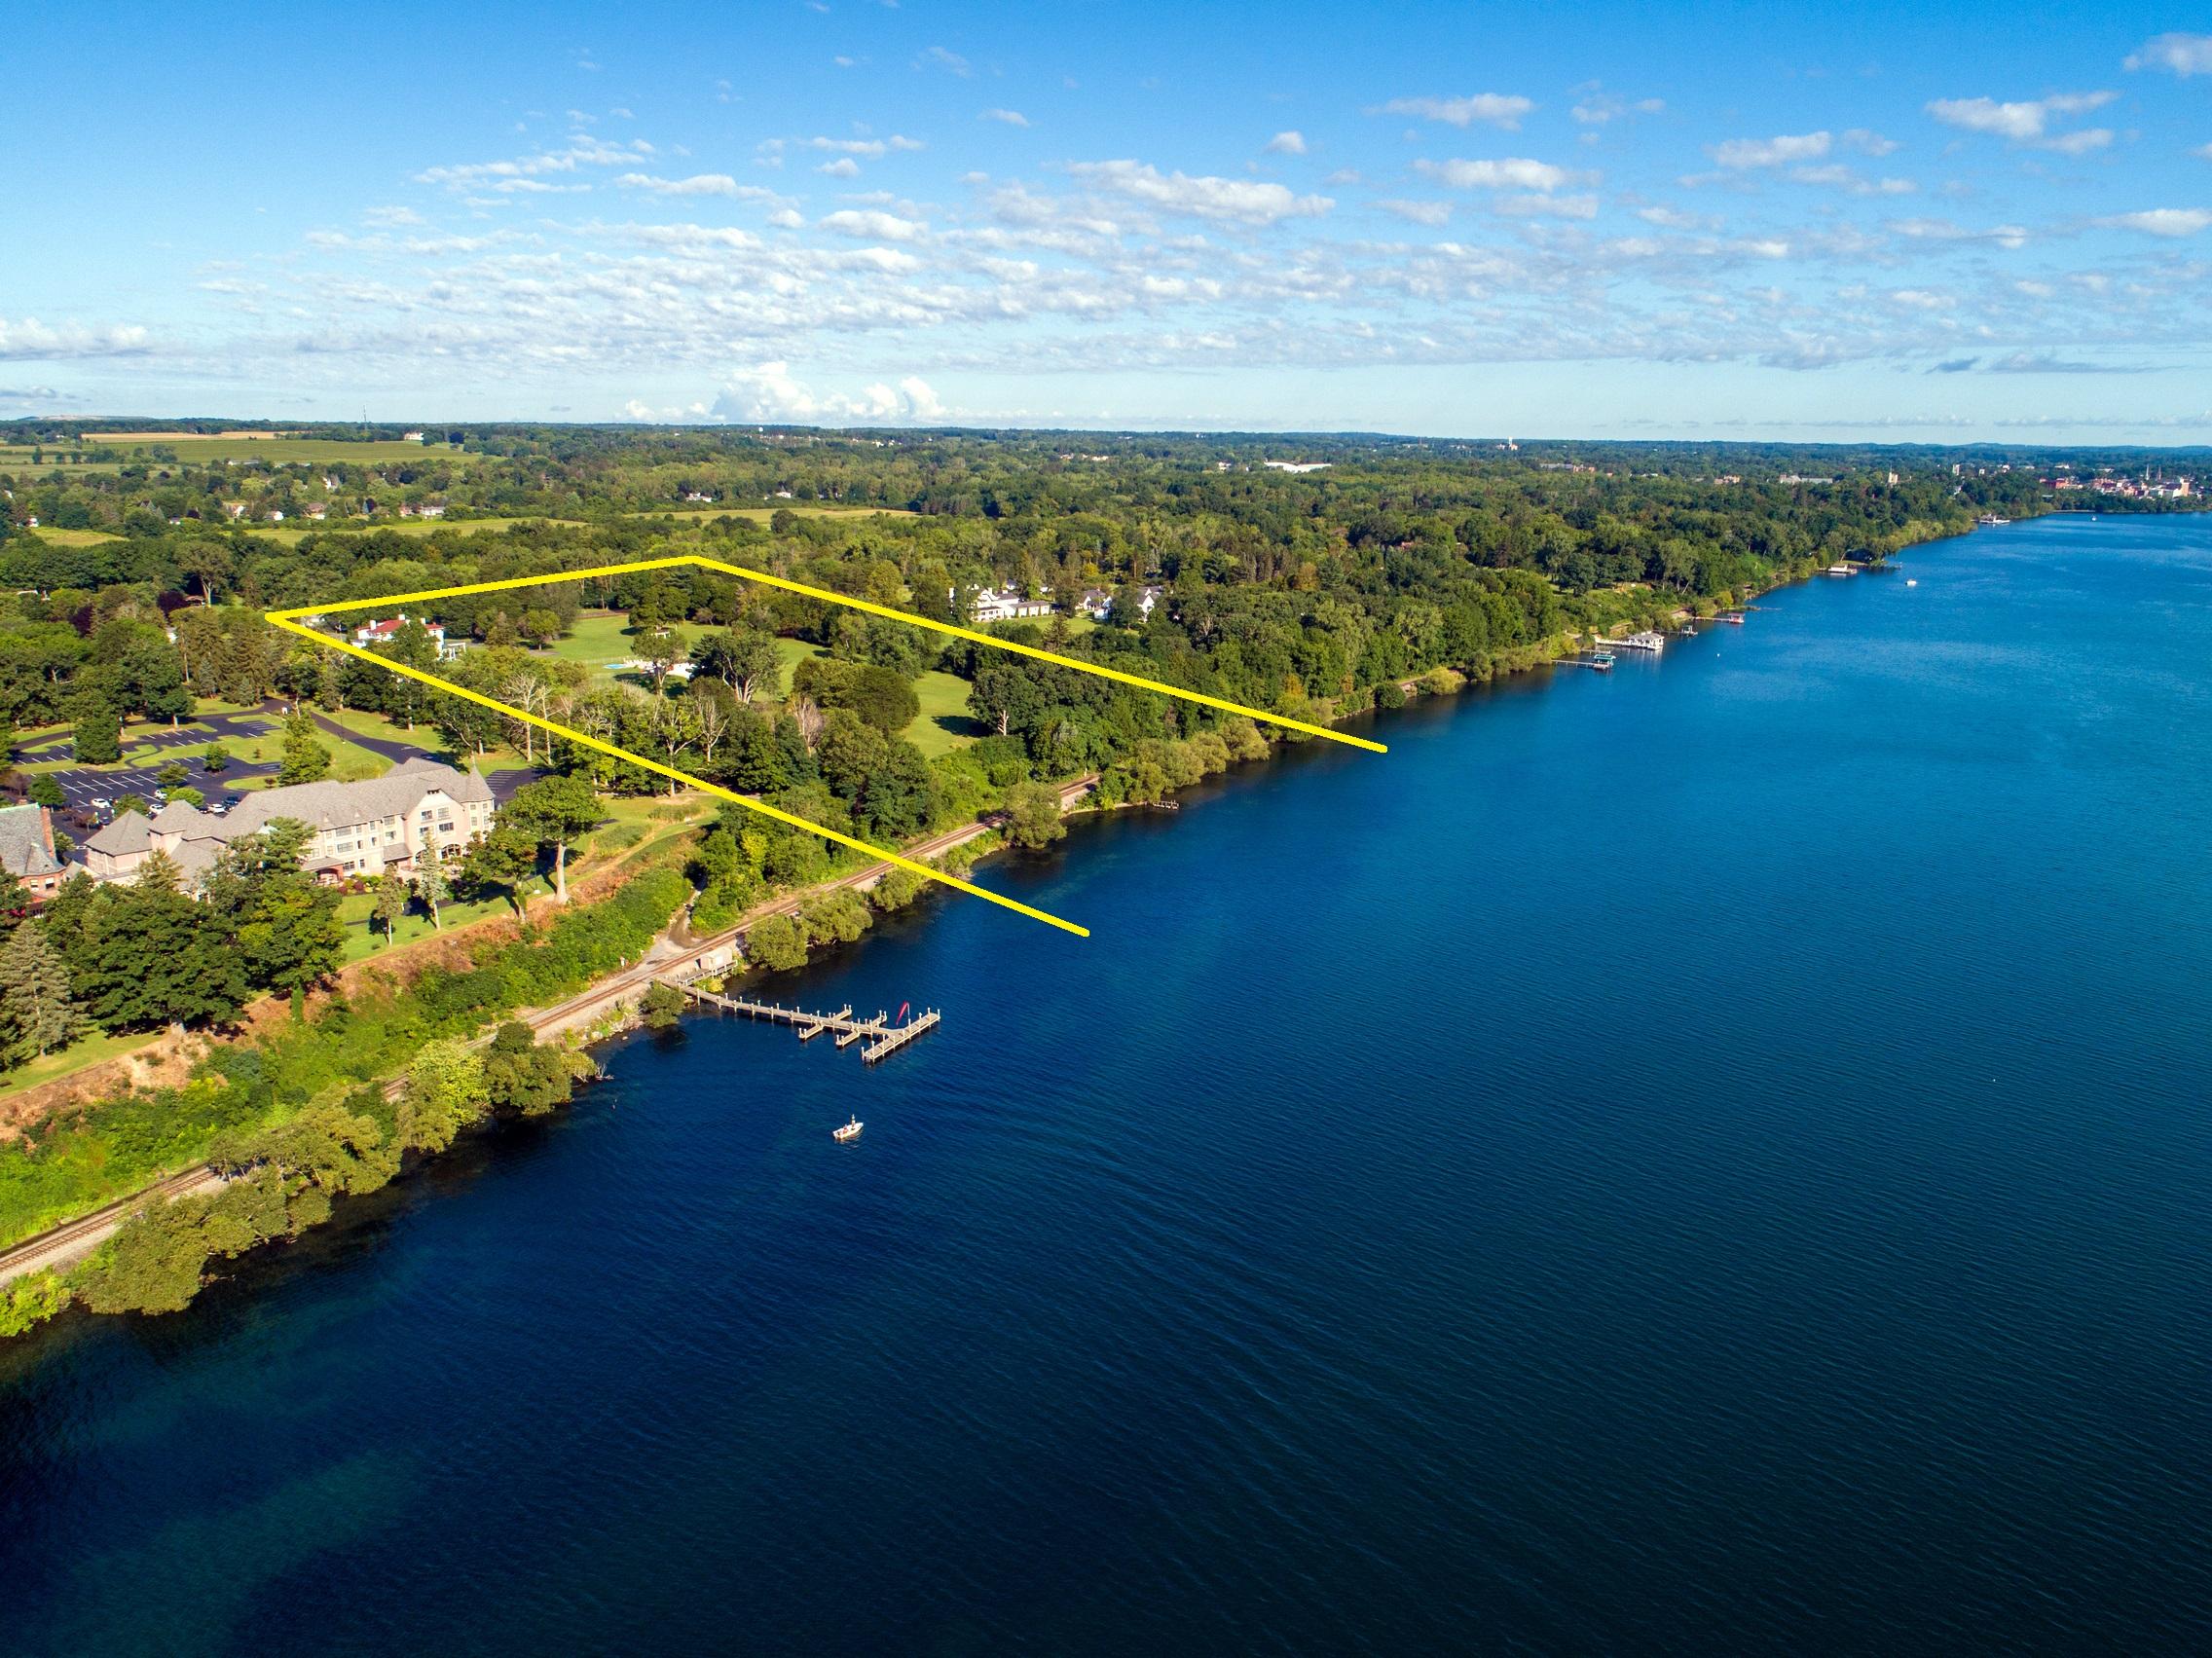 6  Seneca Lake Auction, American Legion, 1115 Lochland Rd, Geneva, NY 14456, Seneca Lake, Finger Lakes Property Listed For Sale by Michael DeRosa, Real Estate Broker, Michael DeRosa Exchange.jpg